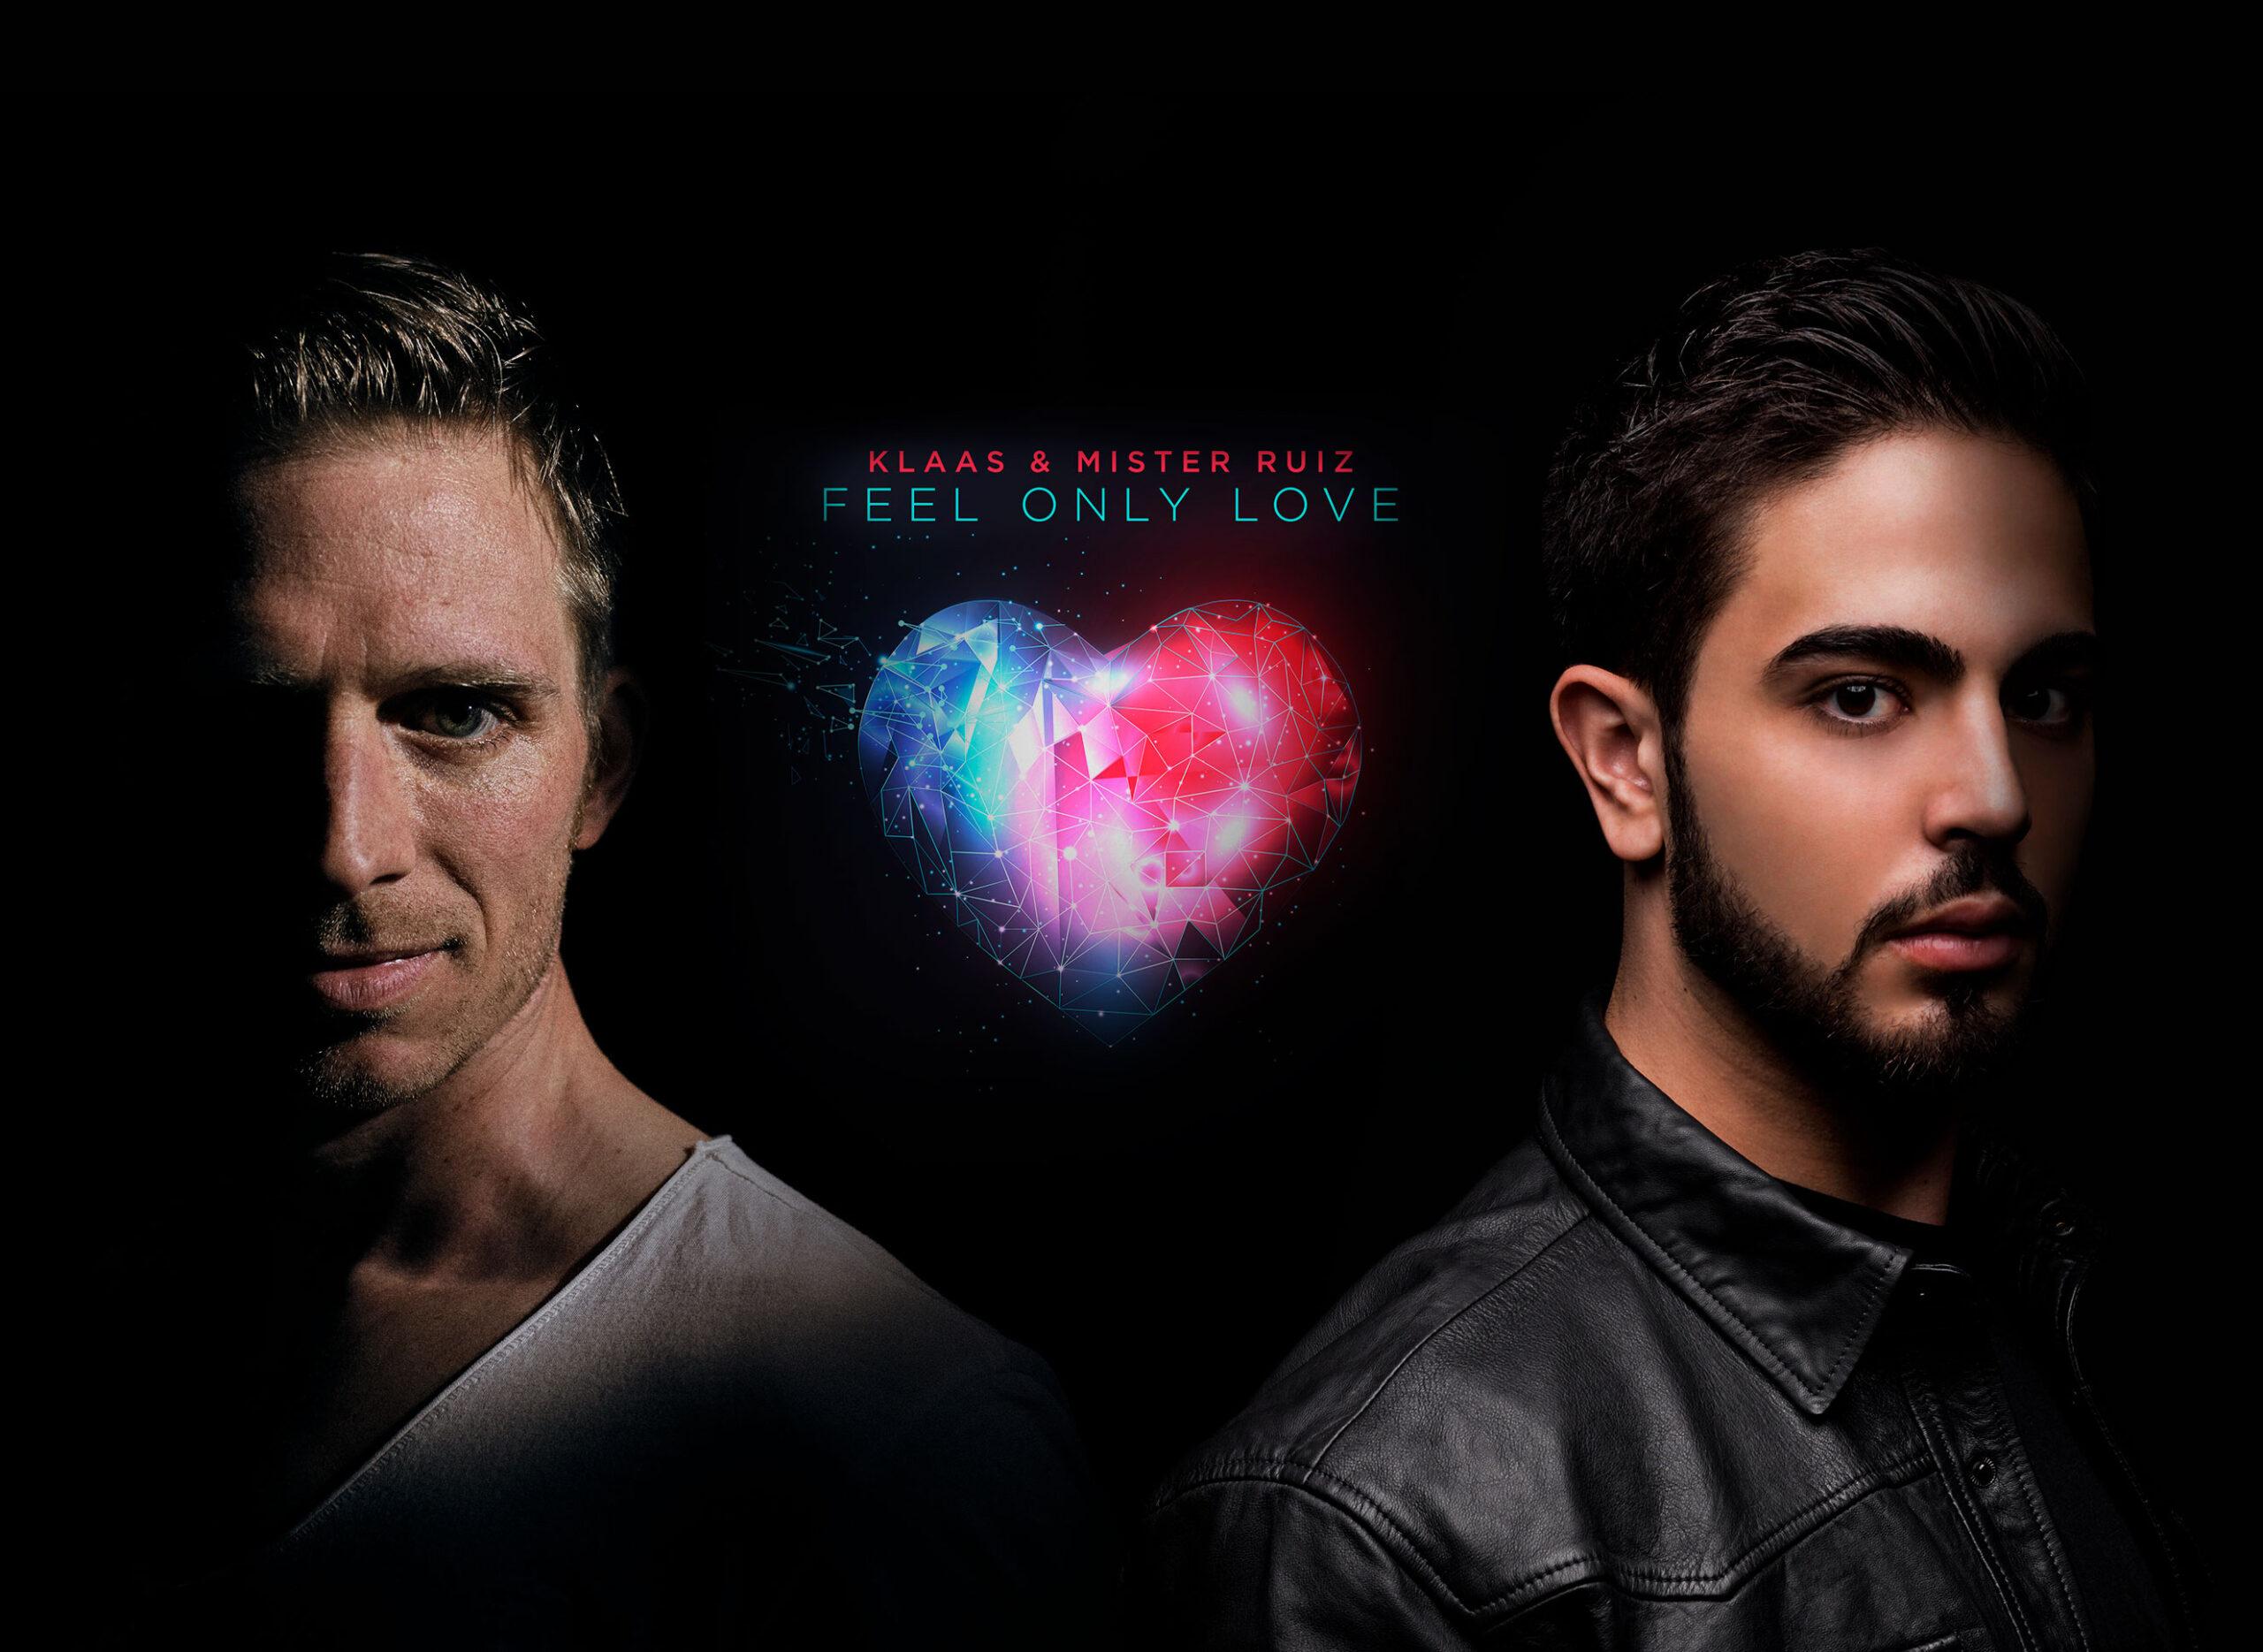 Mister Ruiz & Klaas - Feel Only Love